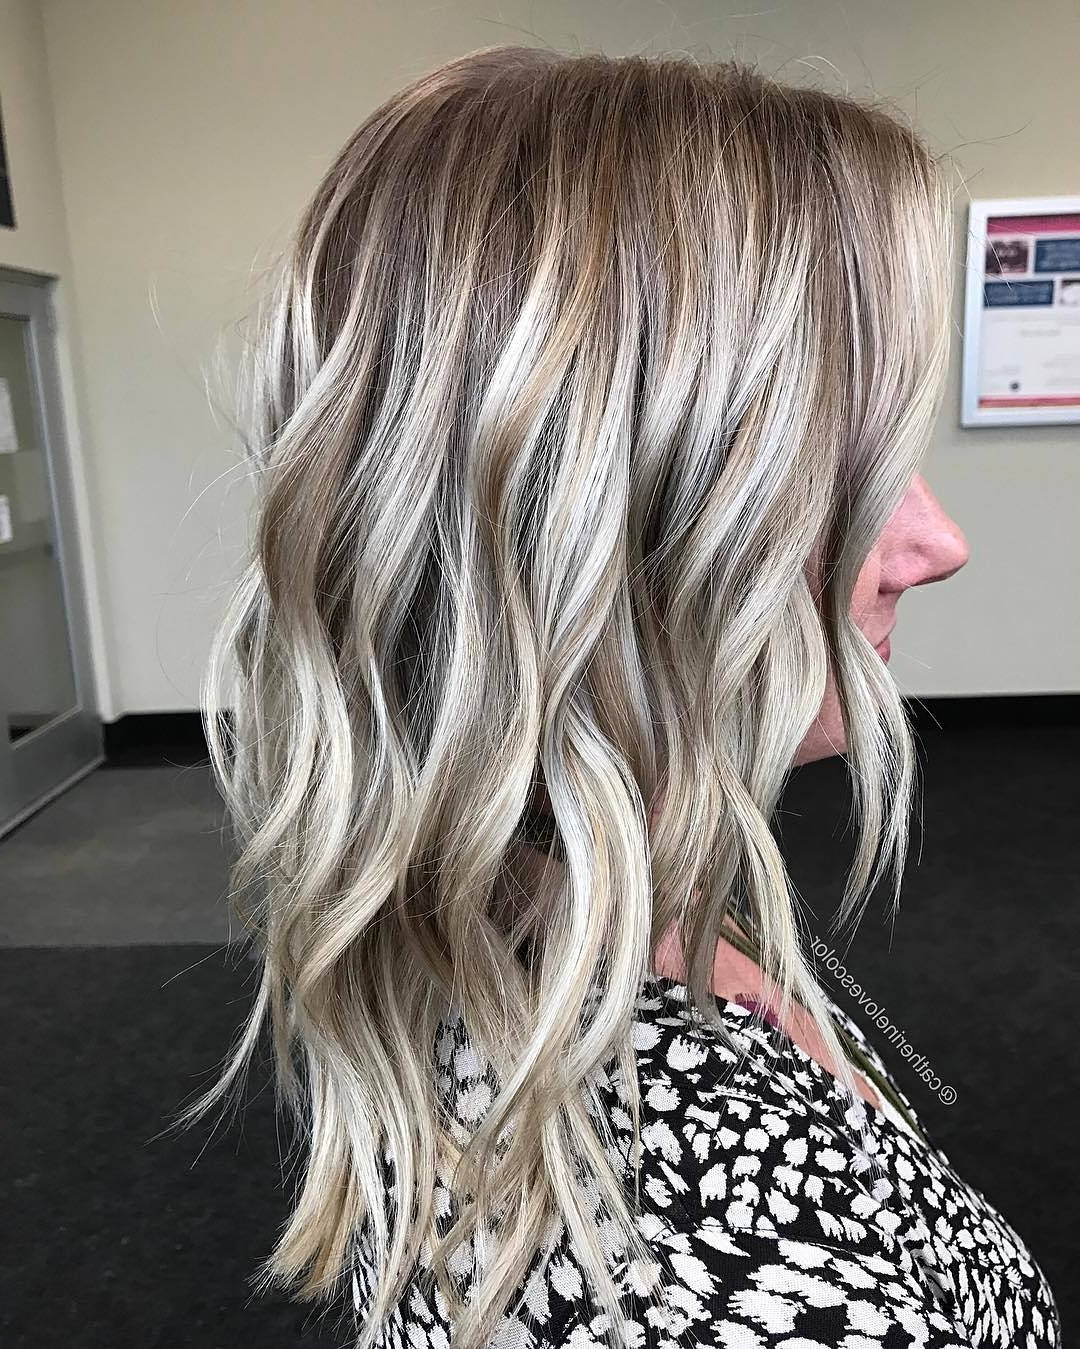 10 Blonde, Brown & Caramel Balayage Hair Color Ideas You In Brown Blonde Balayage Hairstyles (View 5 of 20)